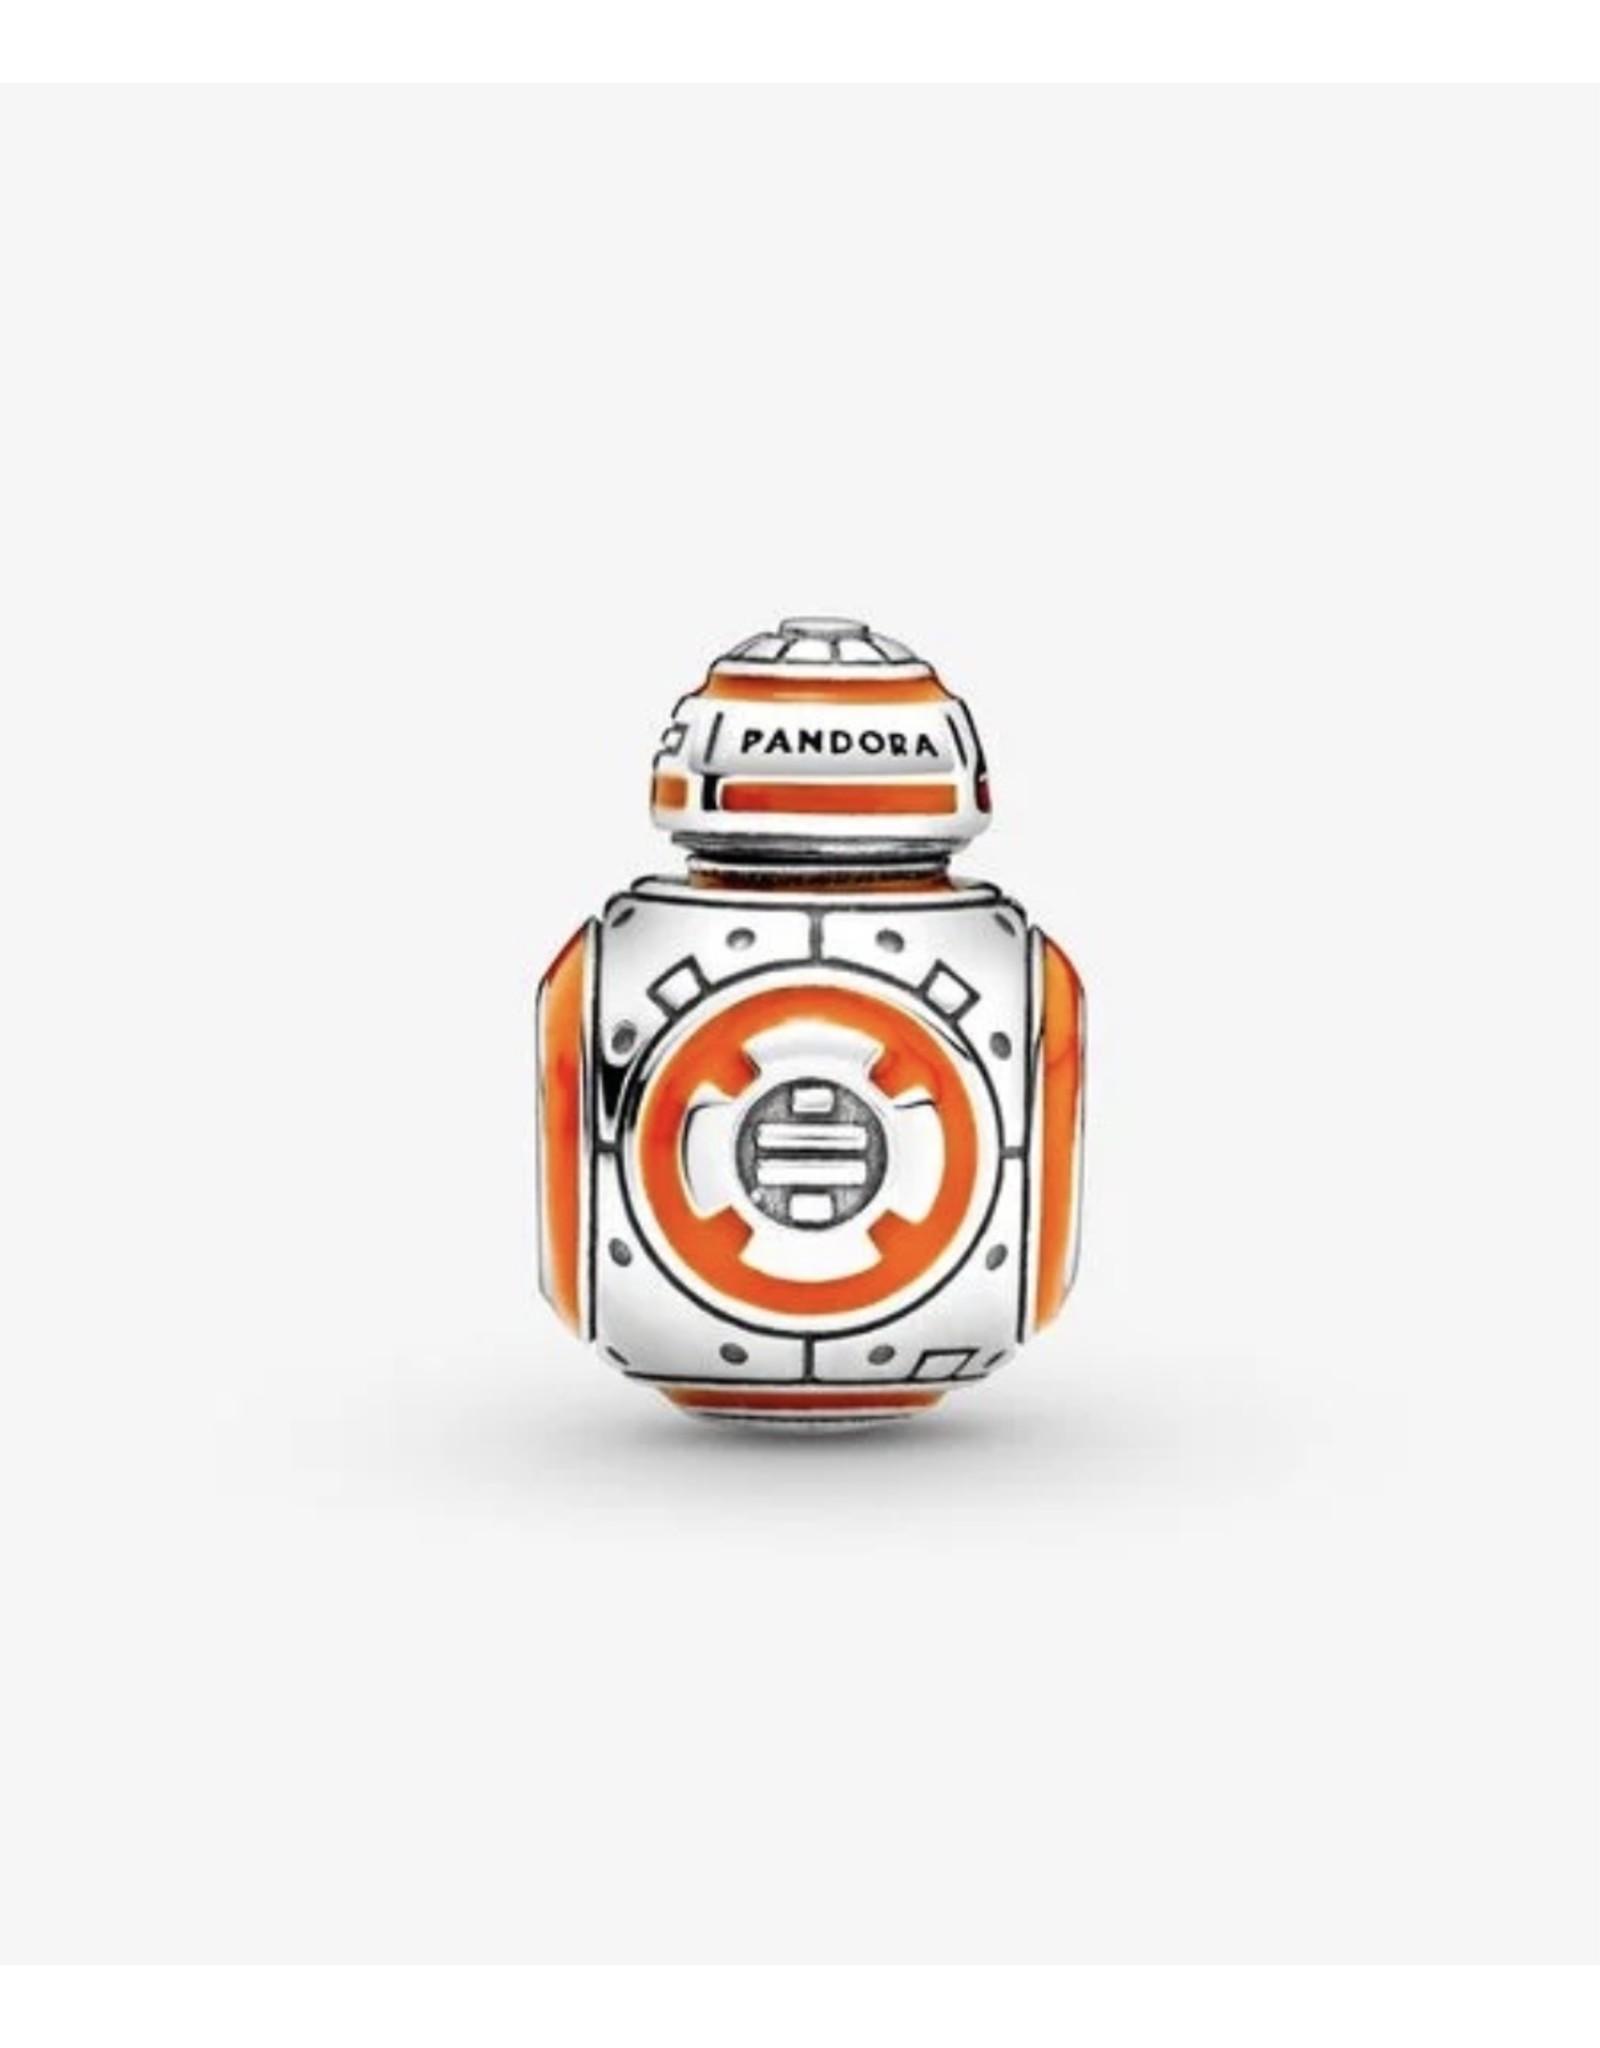 Pandora Pandora Charm,799243C01, BB-8, Black & Orange Enamel